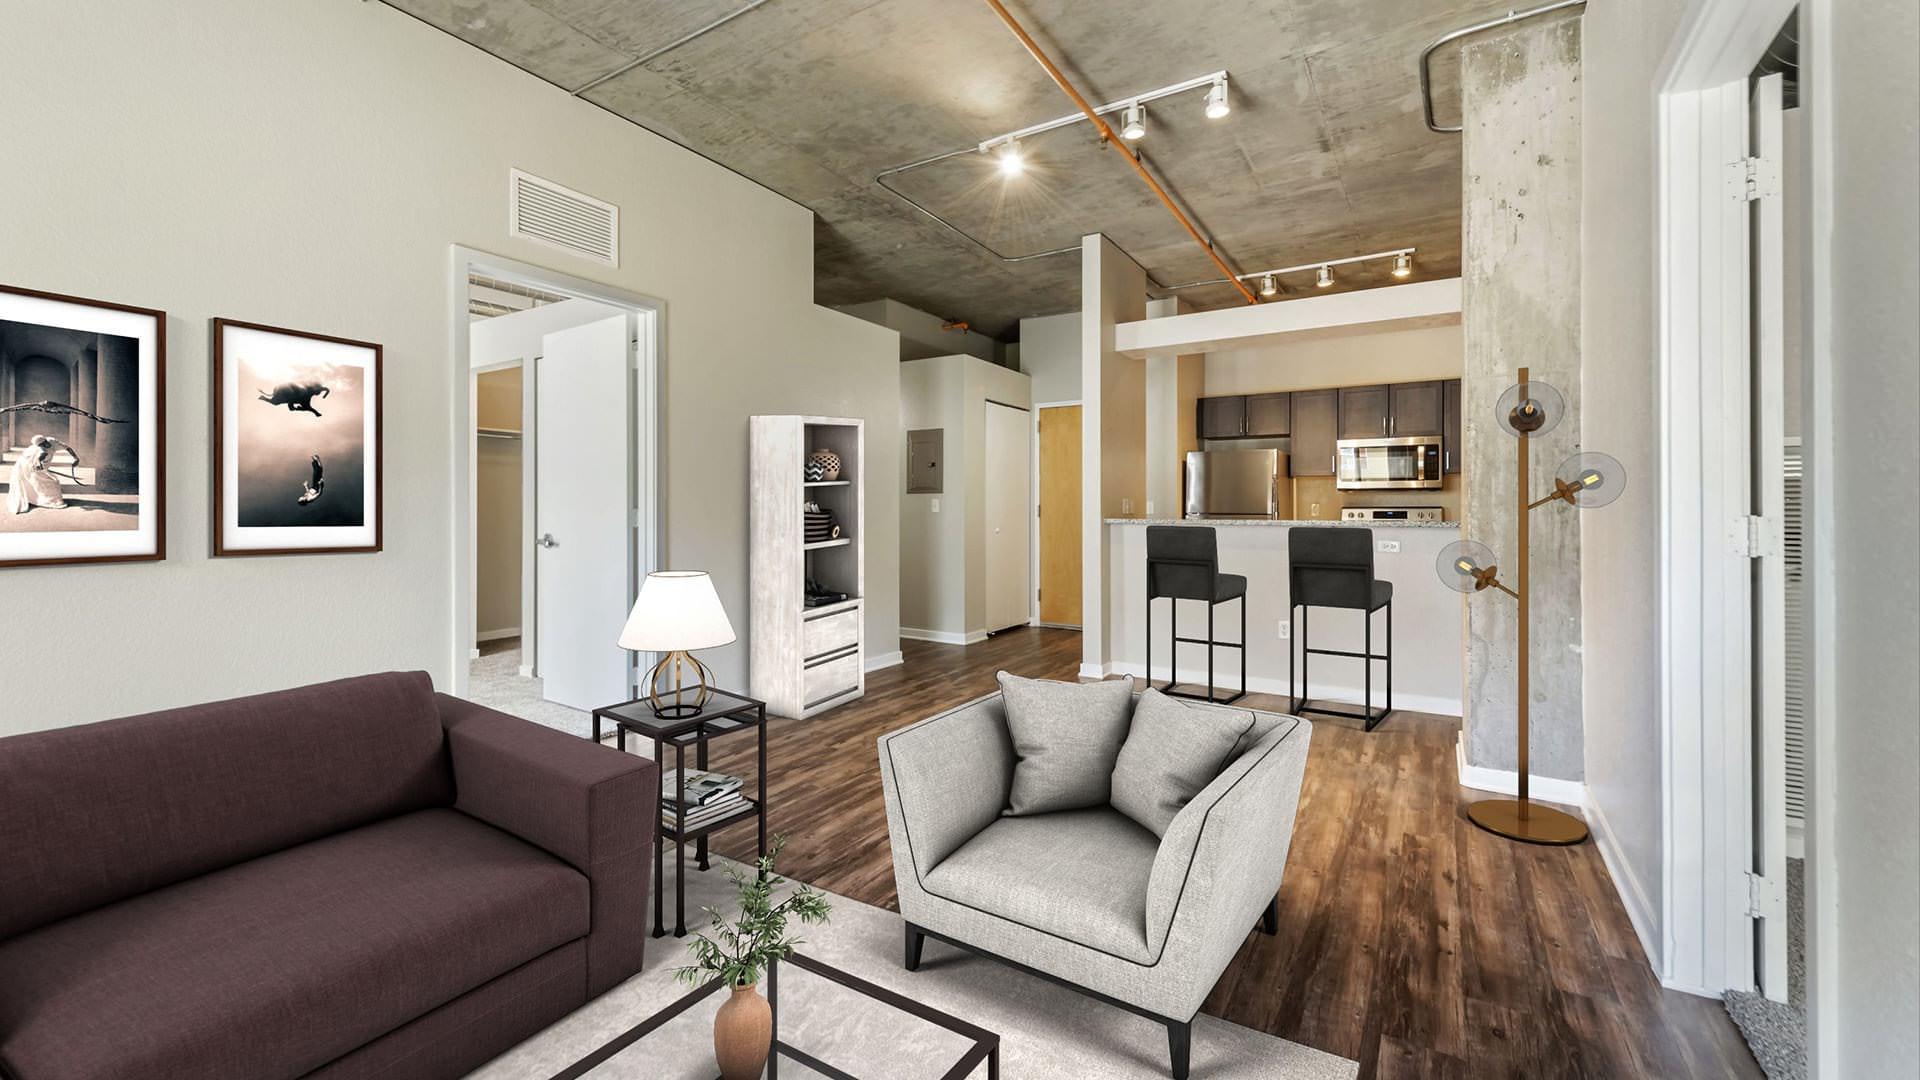 furnished living room with track lighting adjacent to kitchen